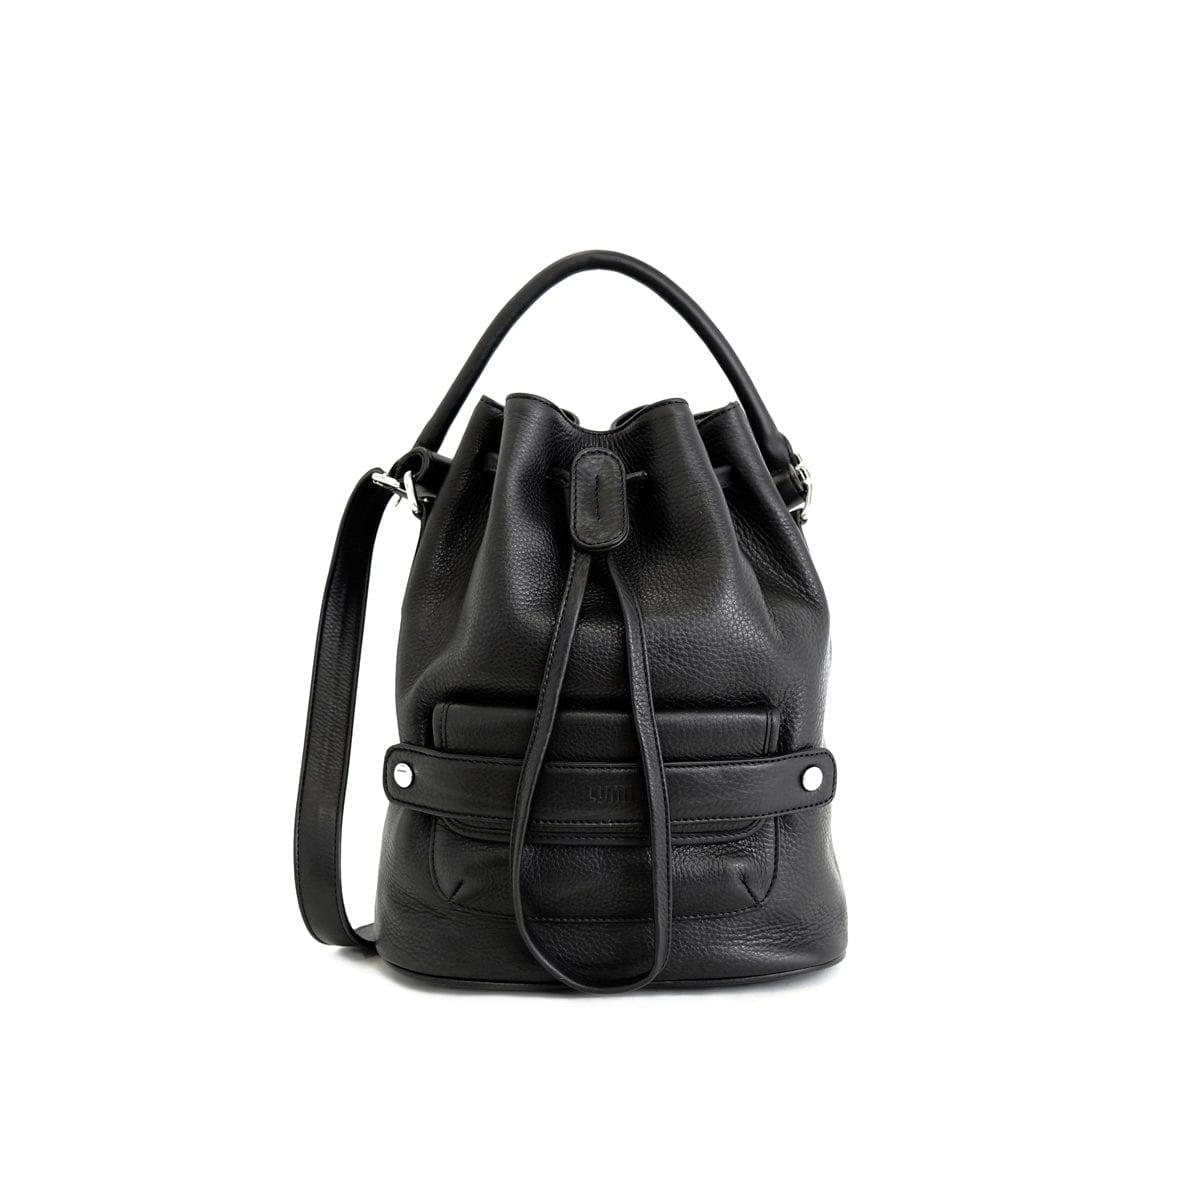 82a0598752 Katariina Large Bucket Bag Black – Lumi Accessories